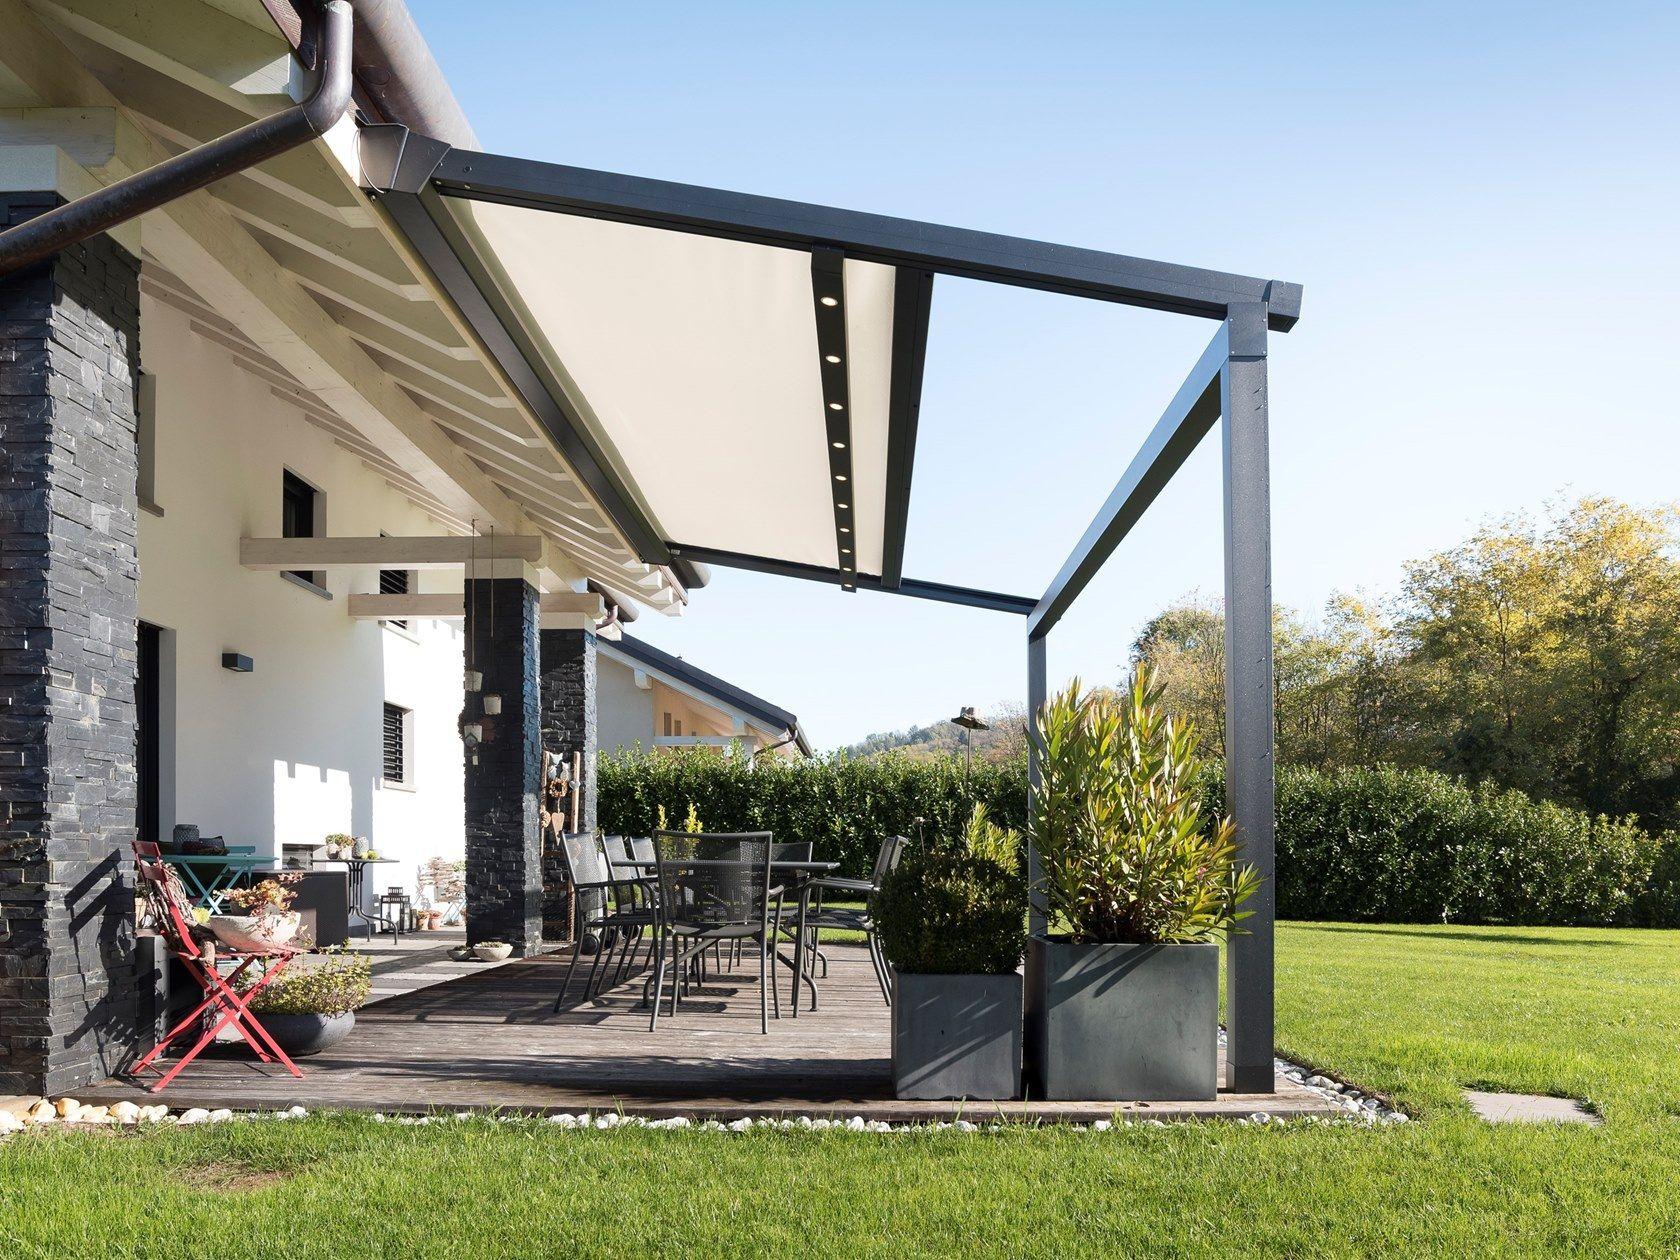 Motorized Pergola With Sliding Cover Xtesa Plain By Ke Outdoor Design Outdoor Design Pergola Outdoor Areas